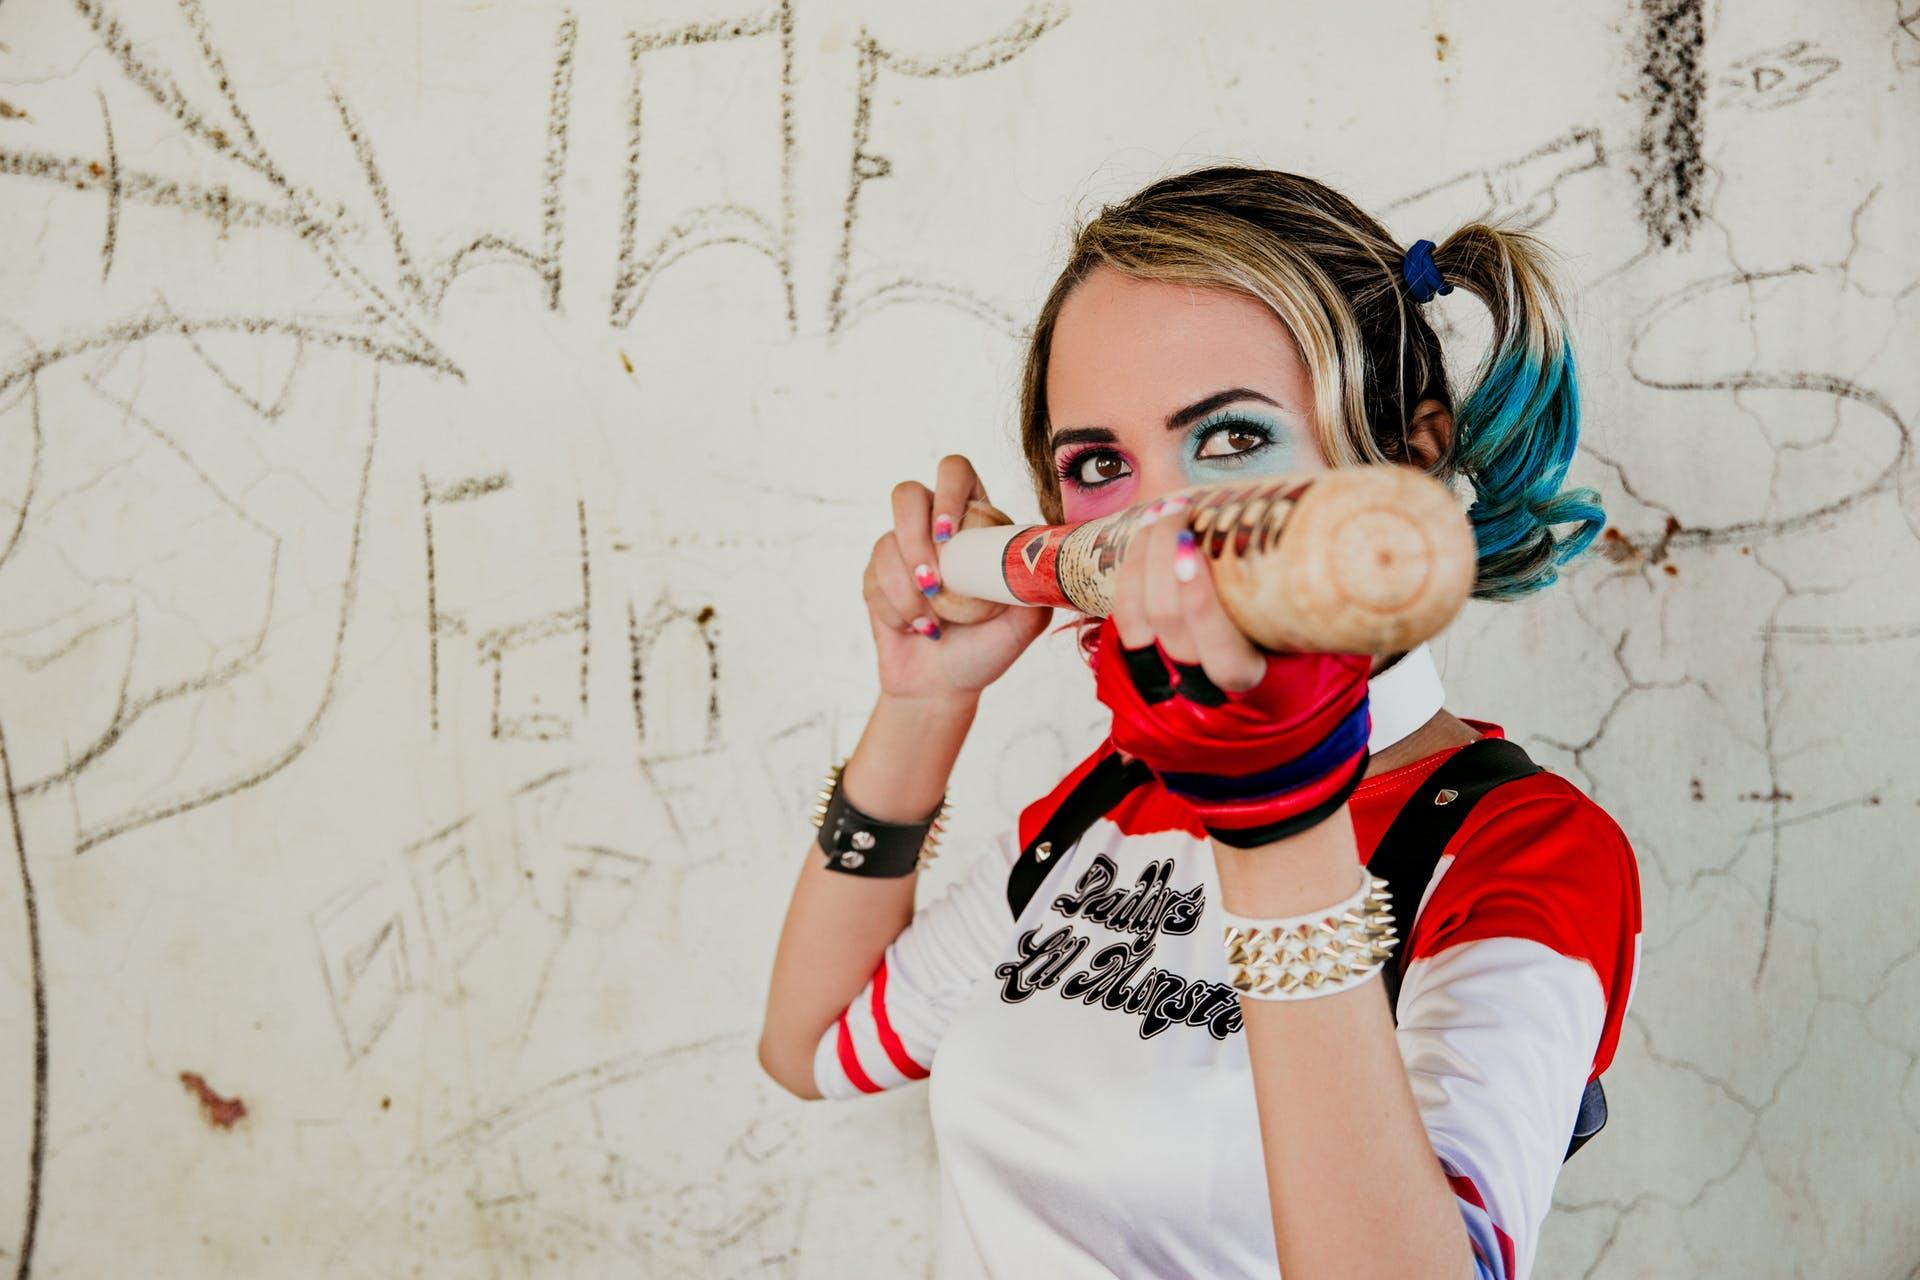 hands photoshoot pose baseball fashion girl woman urban person style